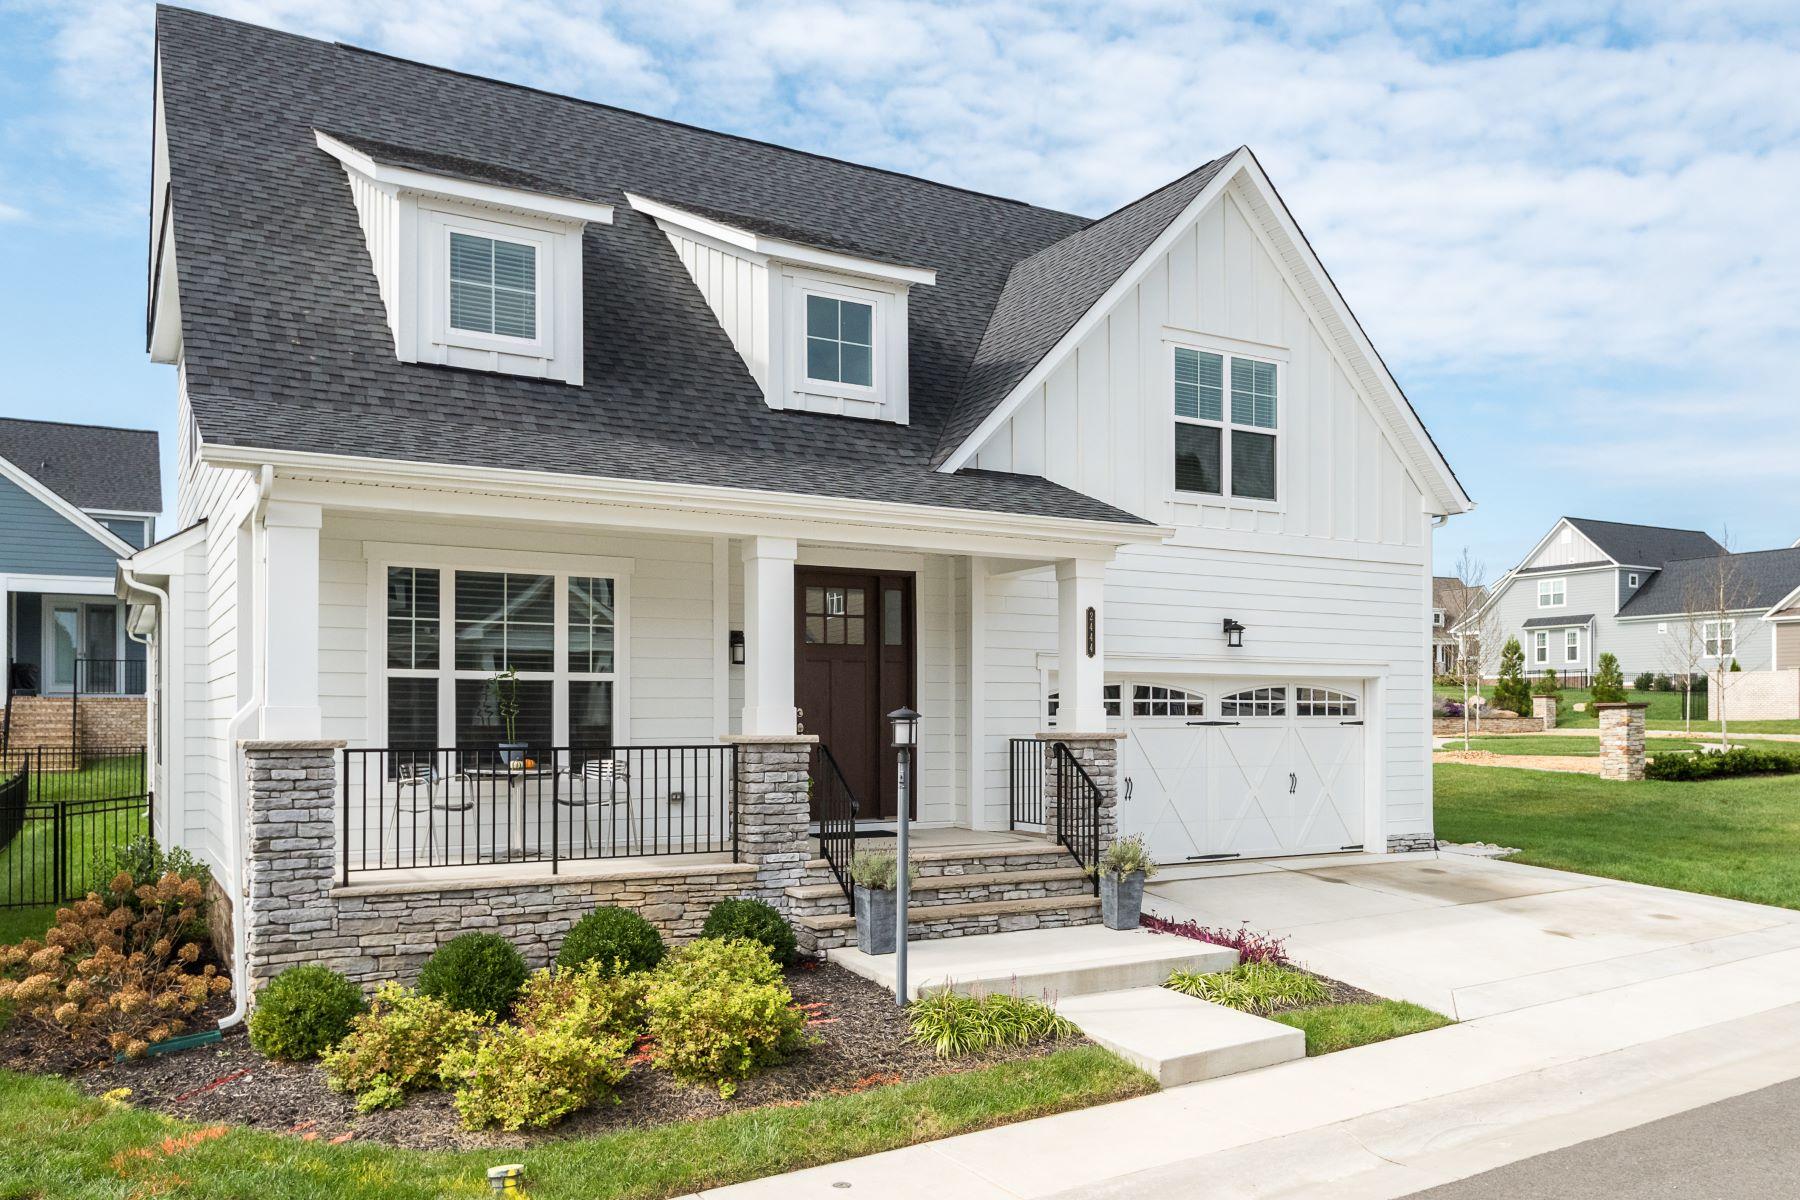 Condominiums for Sale at 2444 Gold Leaf Circle, Henrico, Va, 23233 Henrico, Virginia 23233 United States